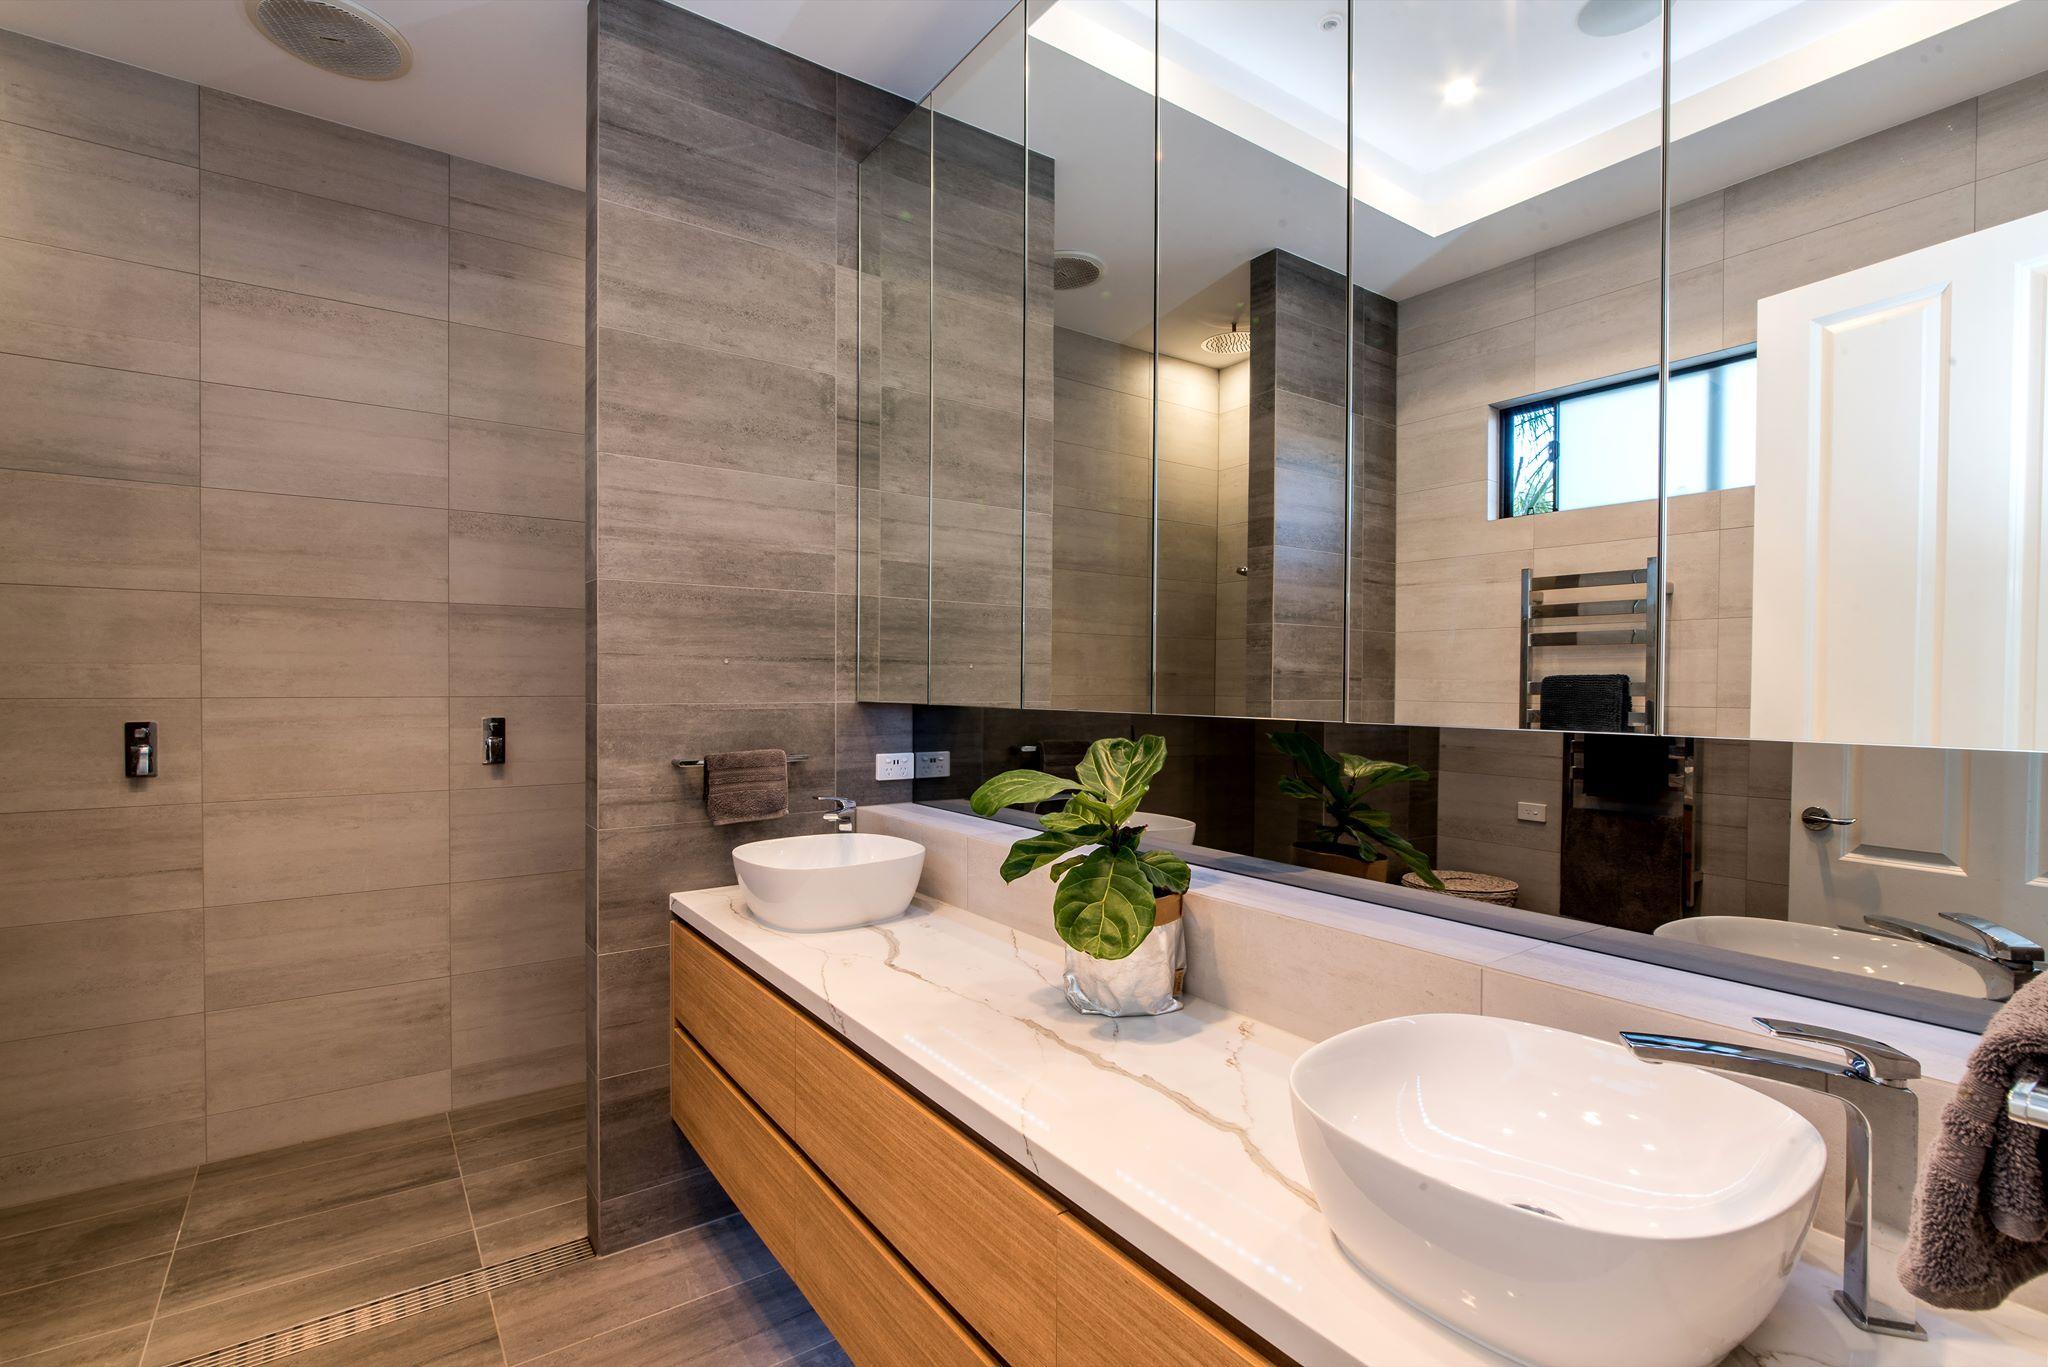 A #bathroom retreat #bathroomdesign #bathroomtiles ...